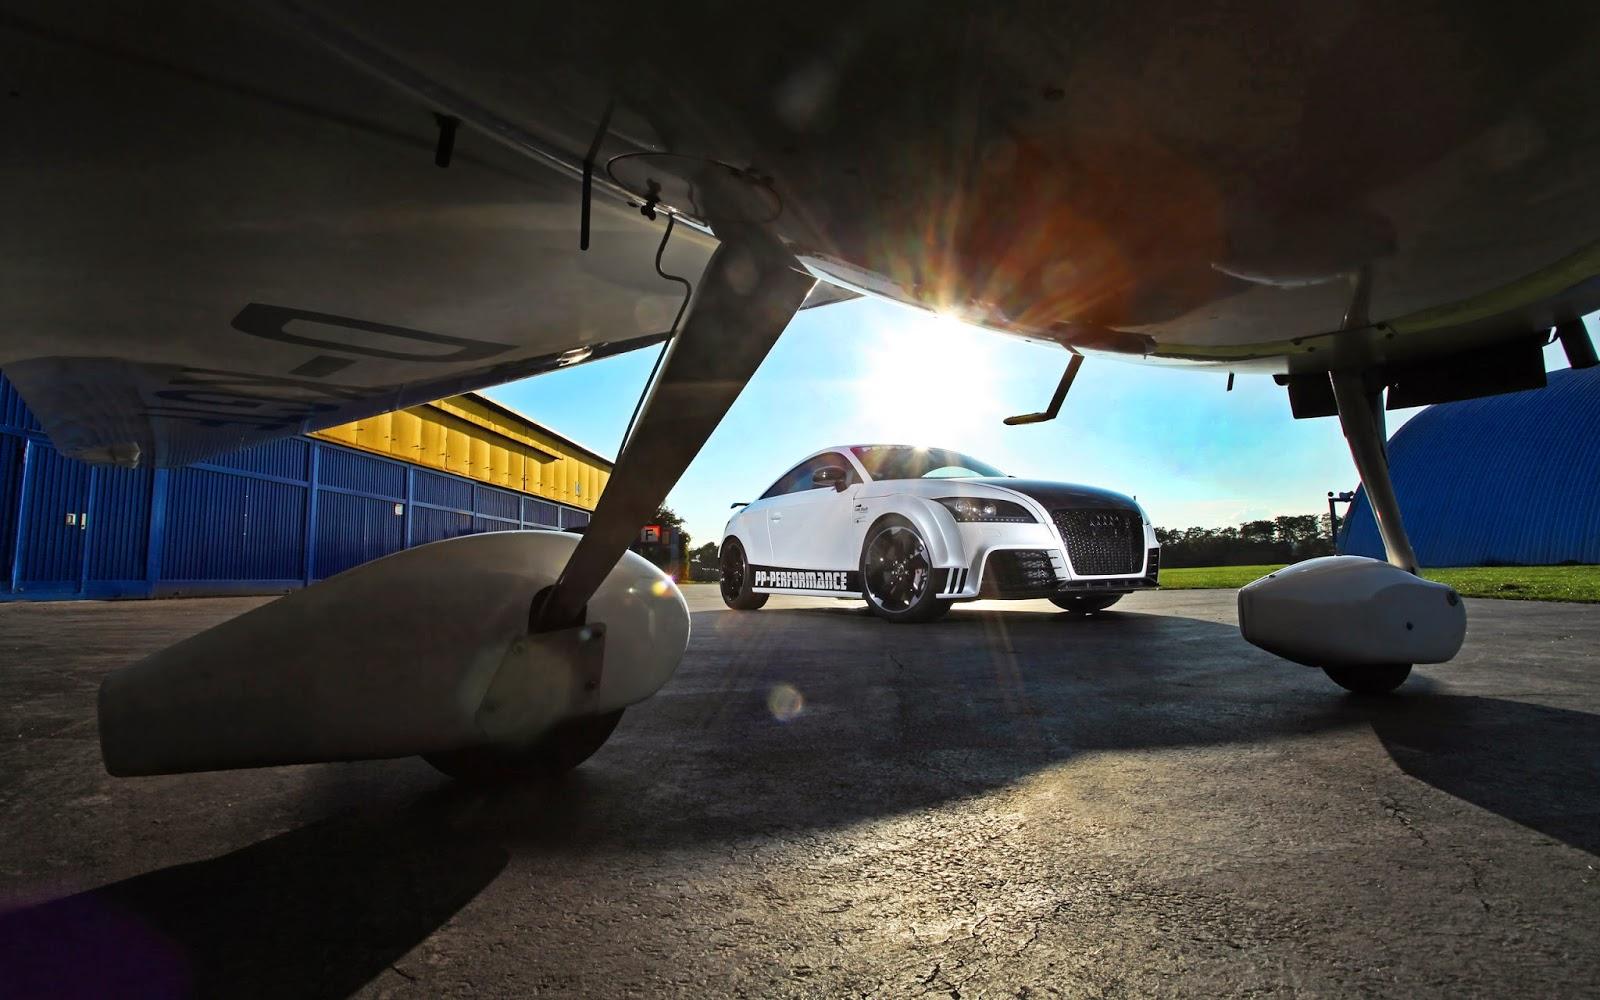 "<img src=""http://3.bp.blogspot.com/-UnzLVFGPPAg/UzXUKO1ykBI/AAAAAAAALP4/kxpmLuh0kJA/s1600/audi-car-wallpapers.jpg"" alt=""Audi Wallpapers"" />"